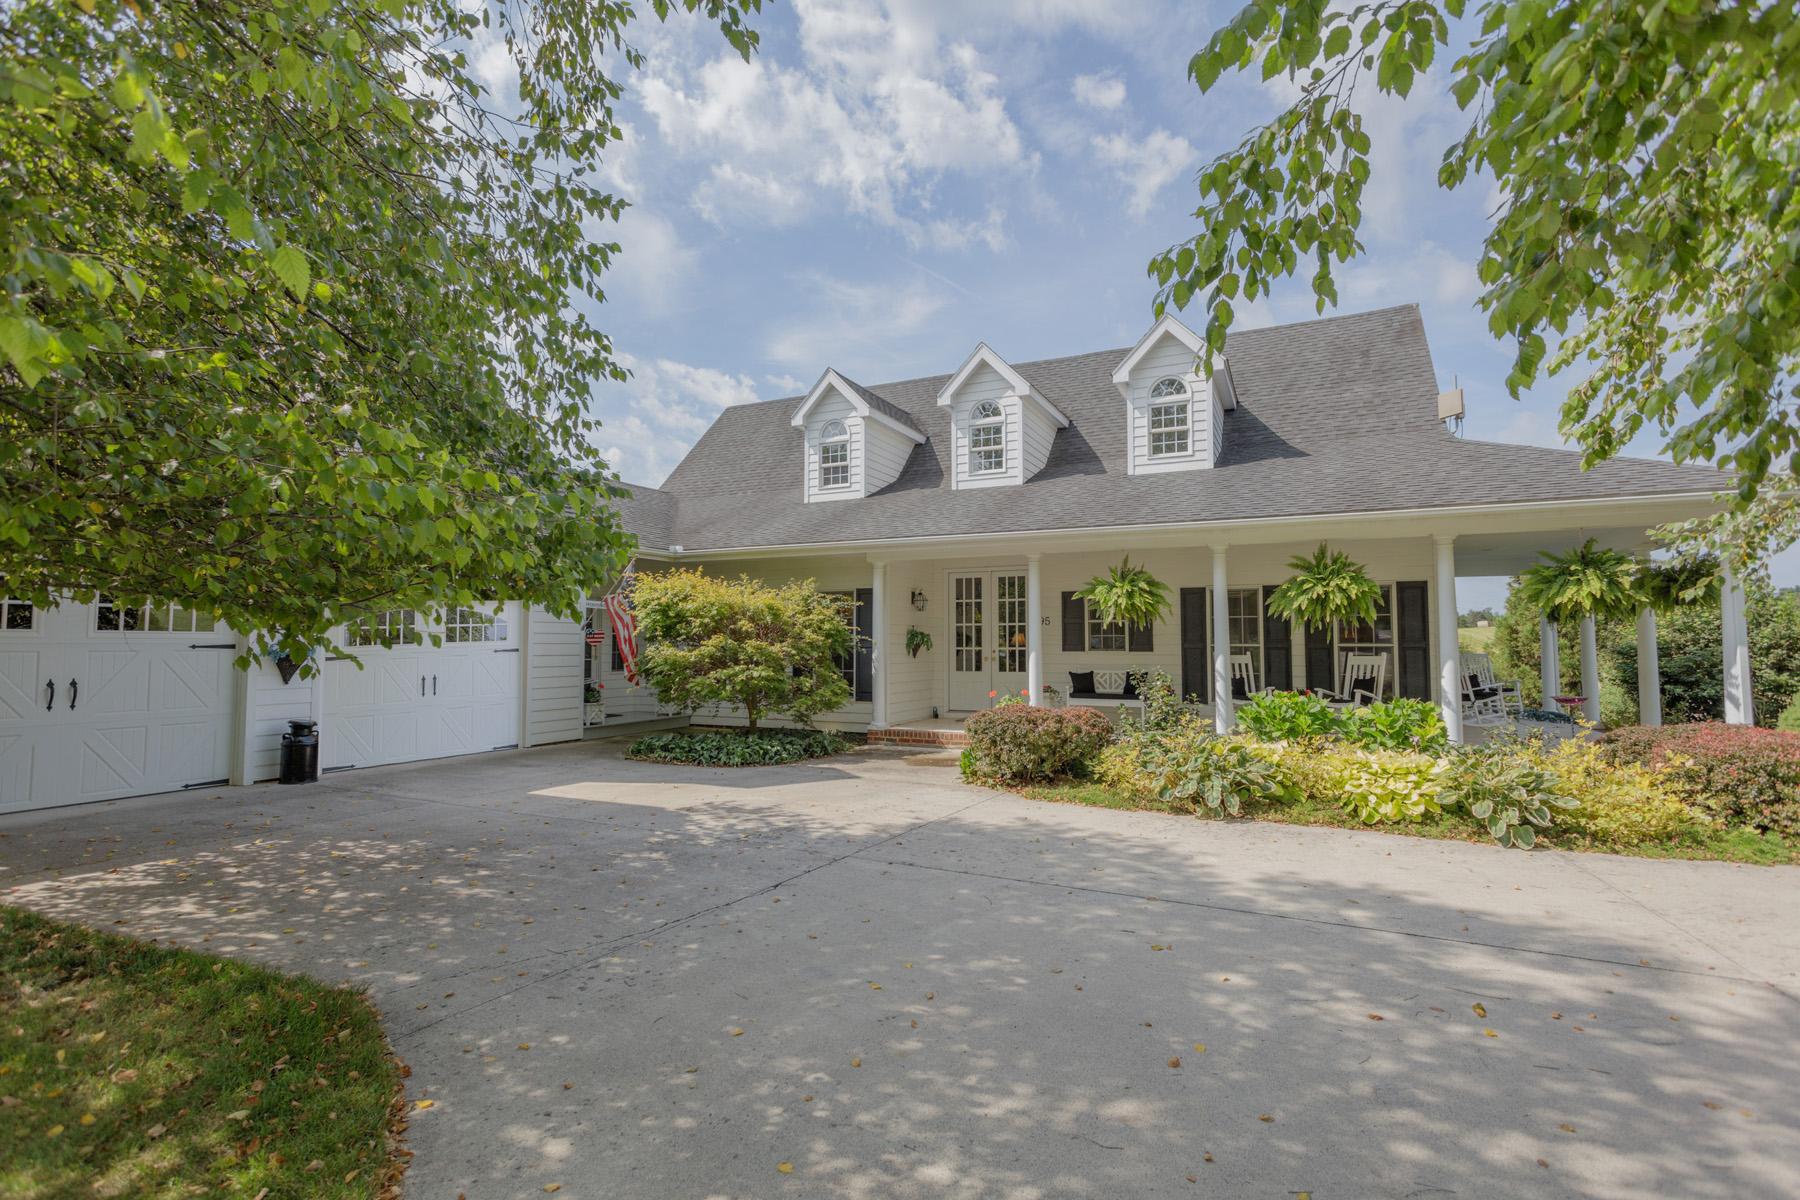 Lexington va real estate feature friday j f brown for Cabins in lexington va